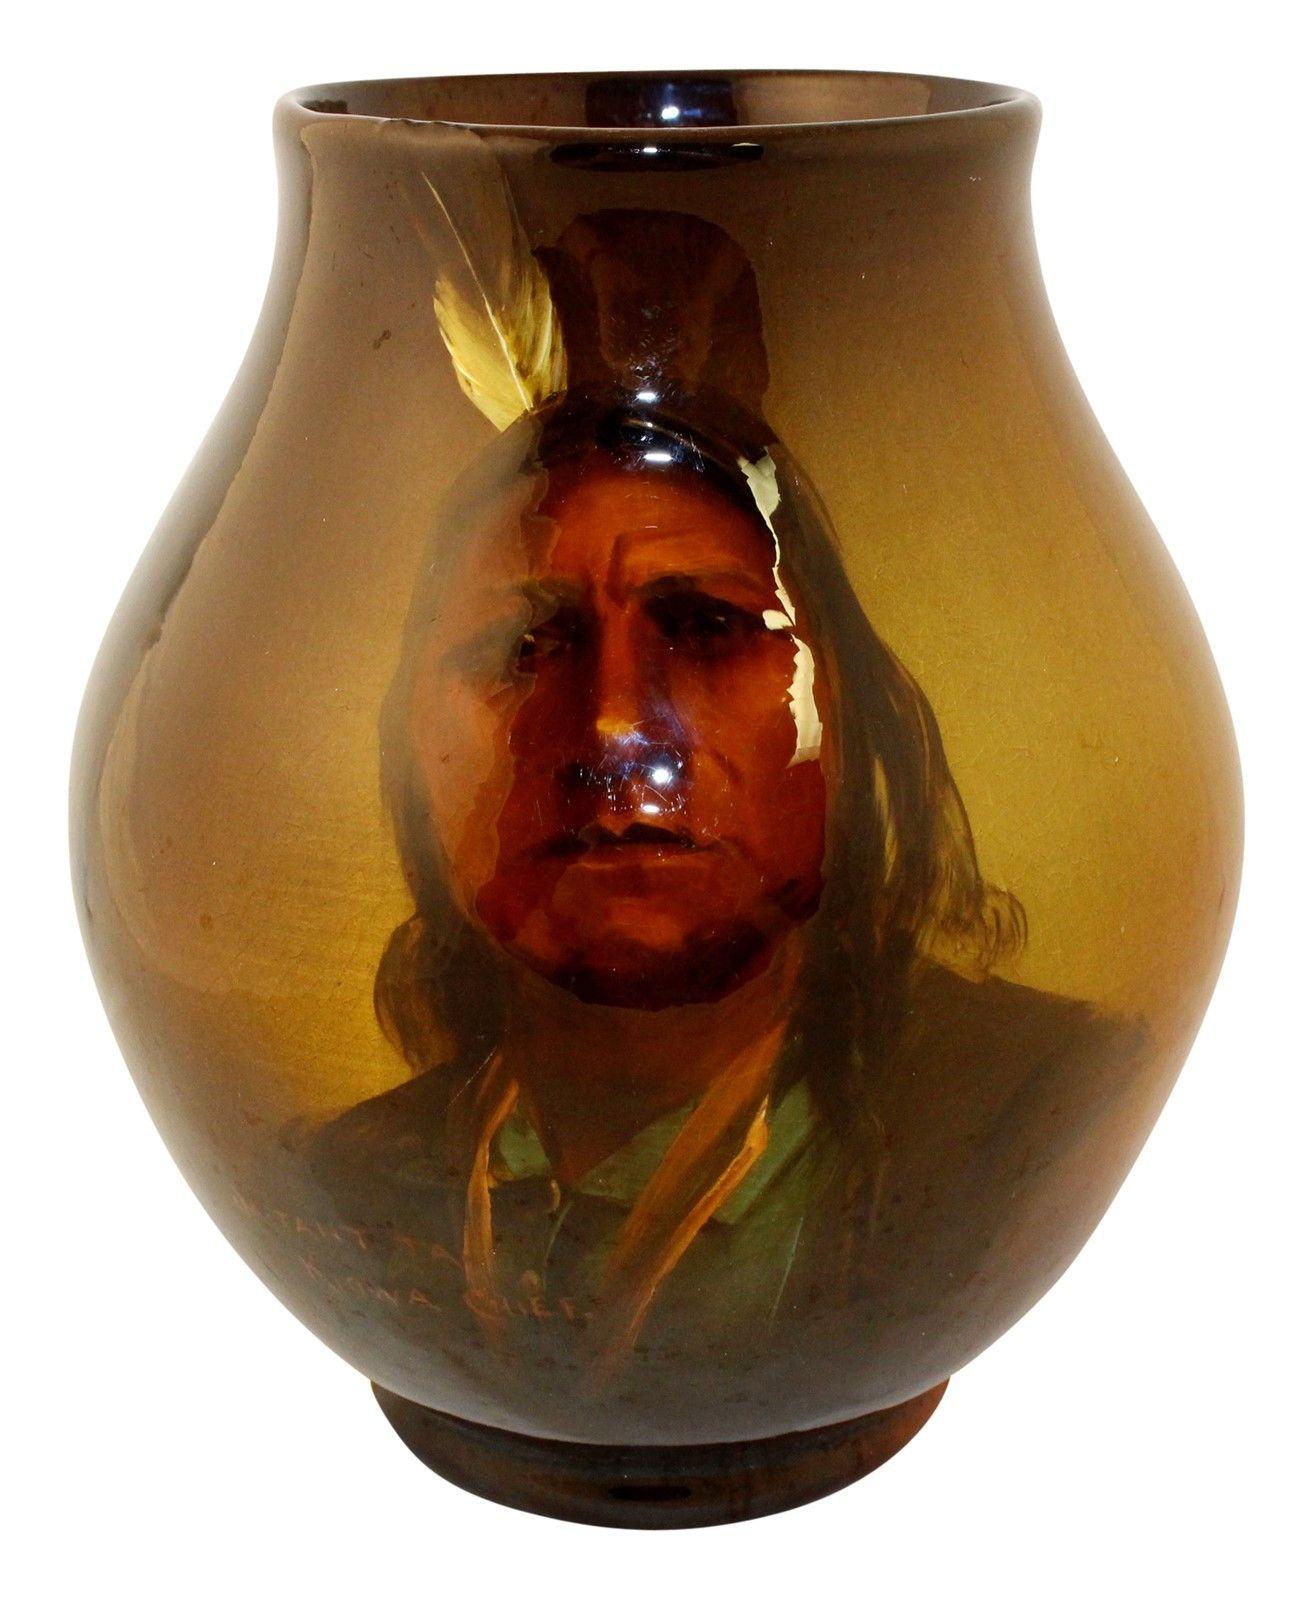 Owens Pottery Utopian Native American Sa-Tant Ta Kiowa Chief (Best)